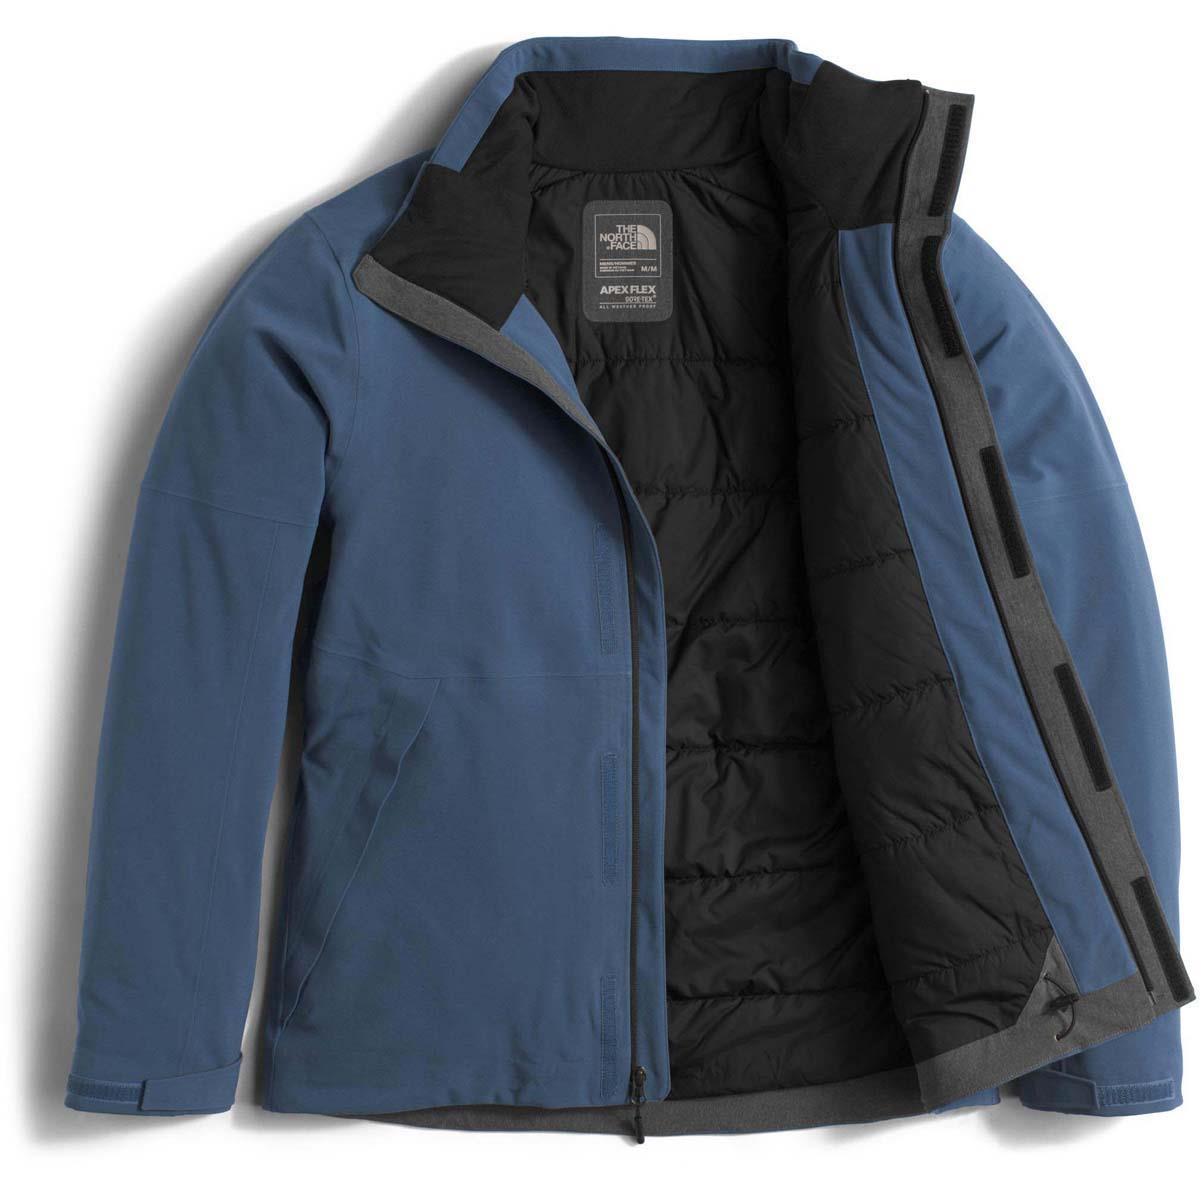 31ef77e96 The North Face Apex Flex GTX Insulated Jacket - Men's